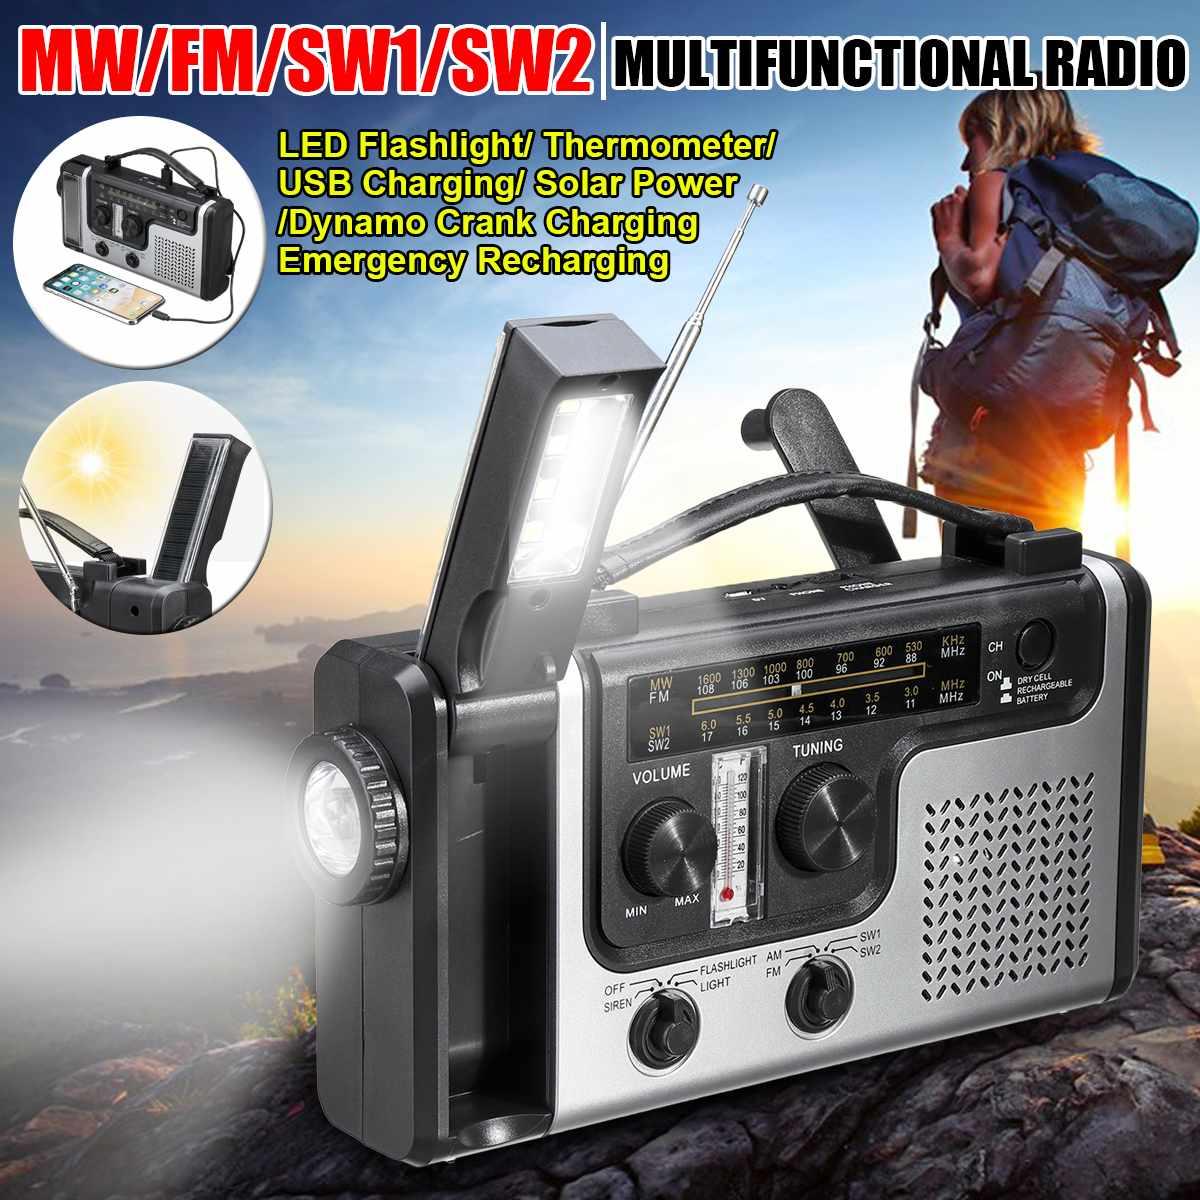 Multifunctional Solar Power Radio Solar MW/FM/SW1/SW2 Thermometer Radio Use Emergency LED Flashlight and USB Charging